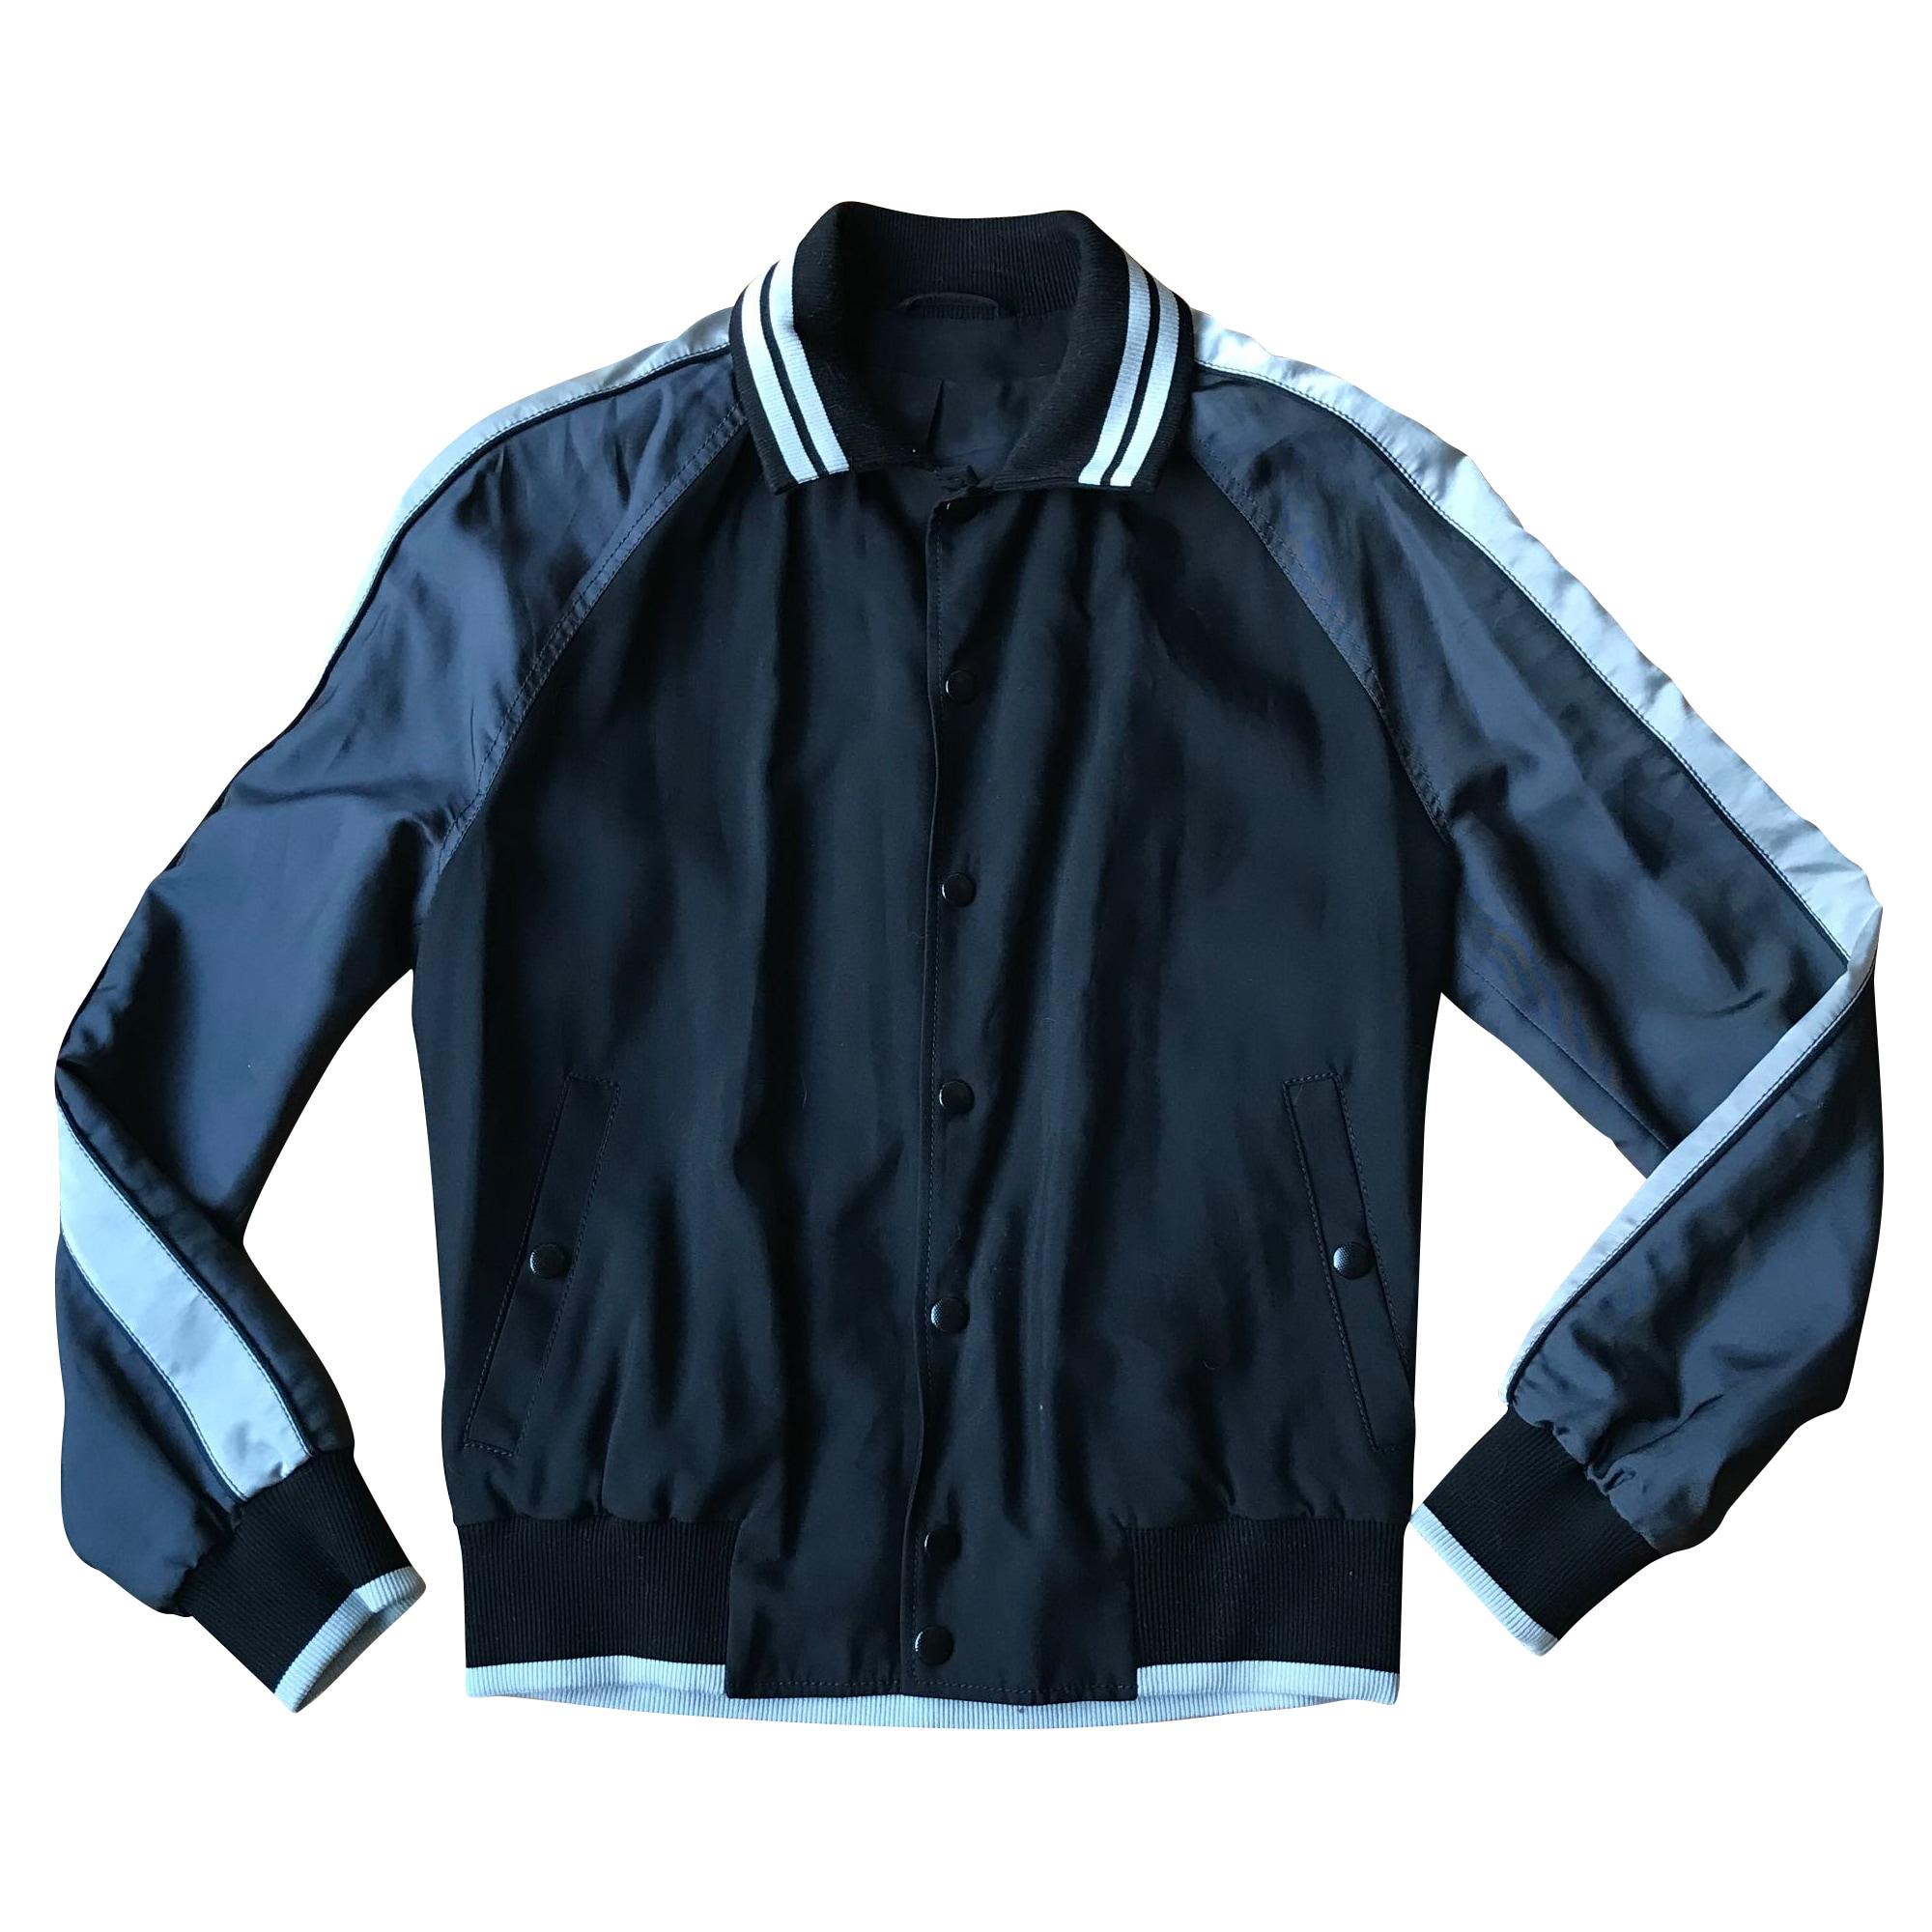 Zipped Jacket LANVIN Black